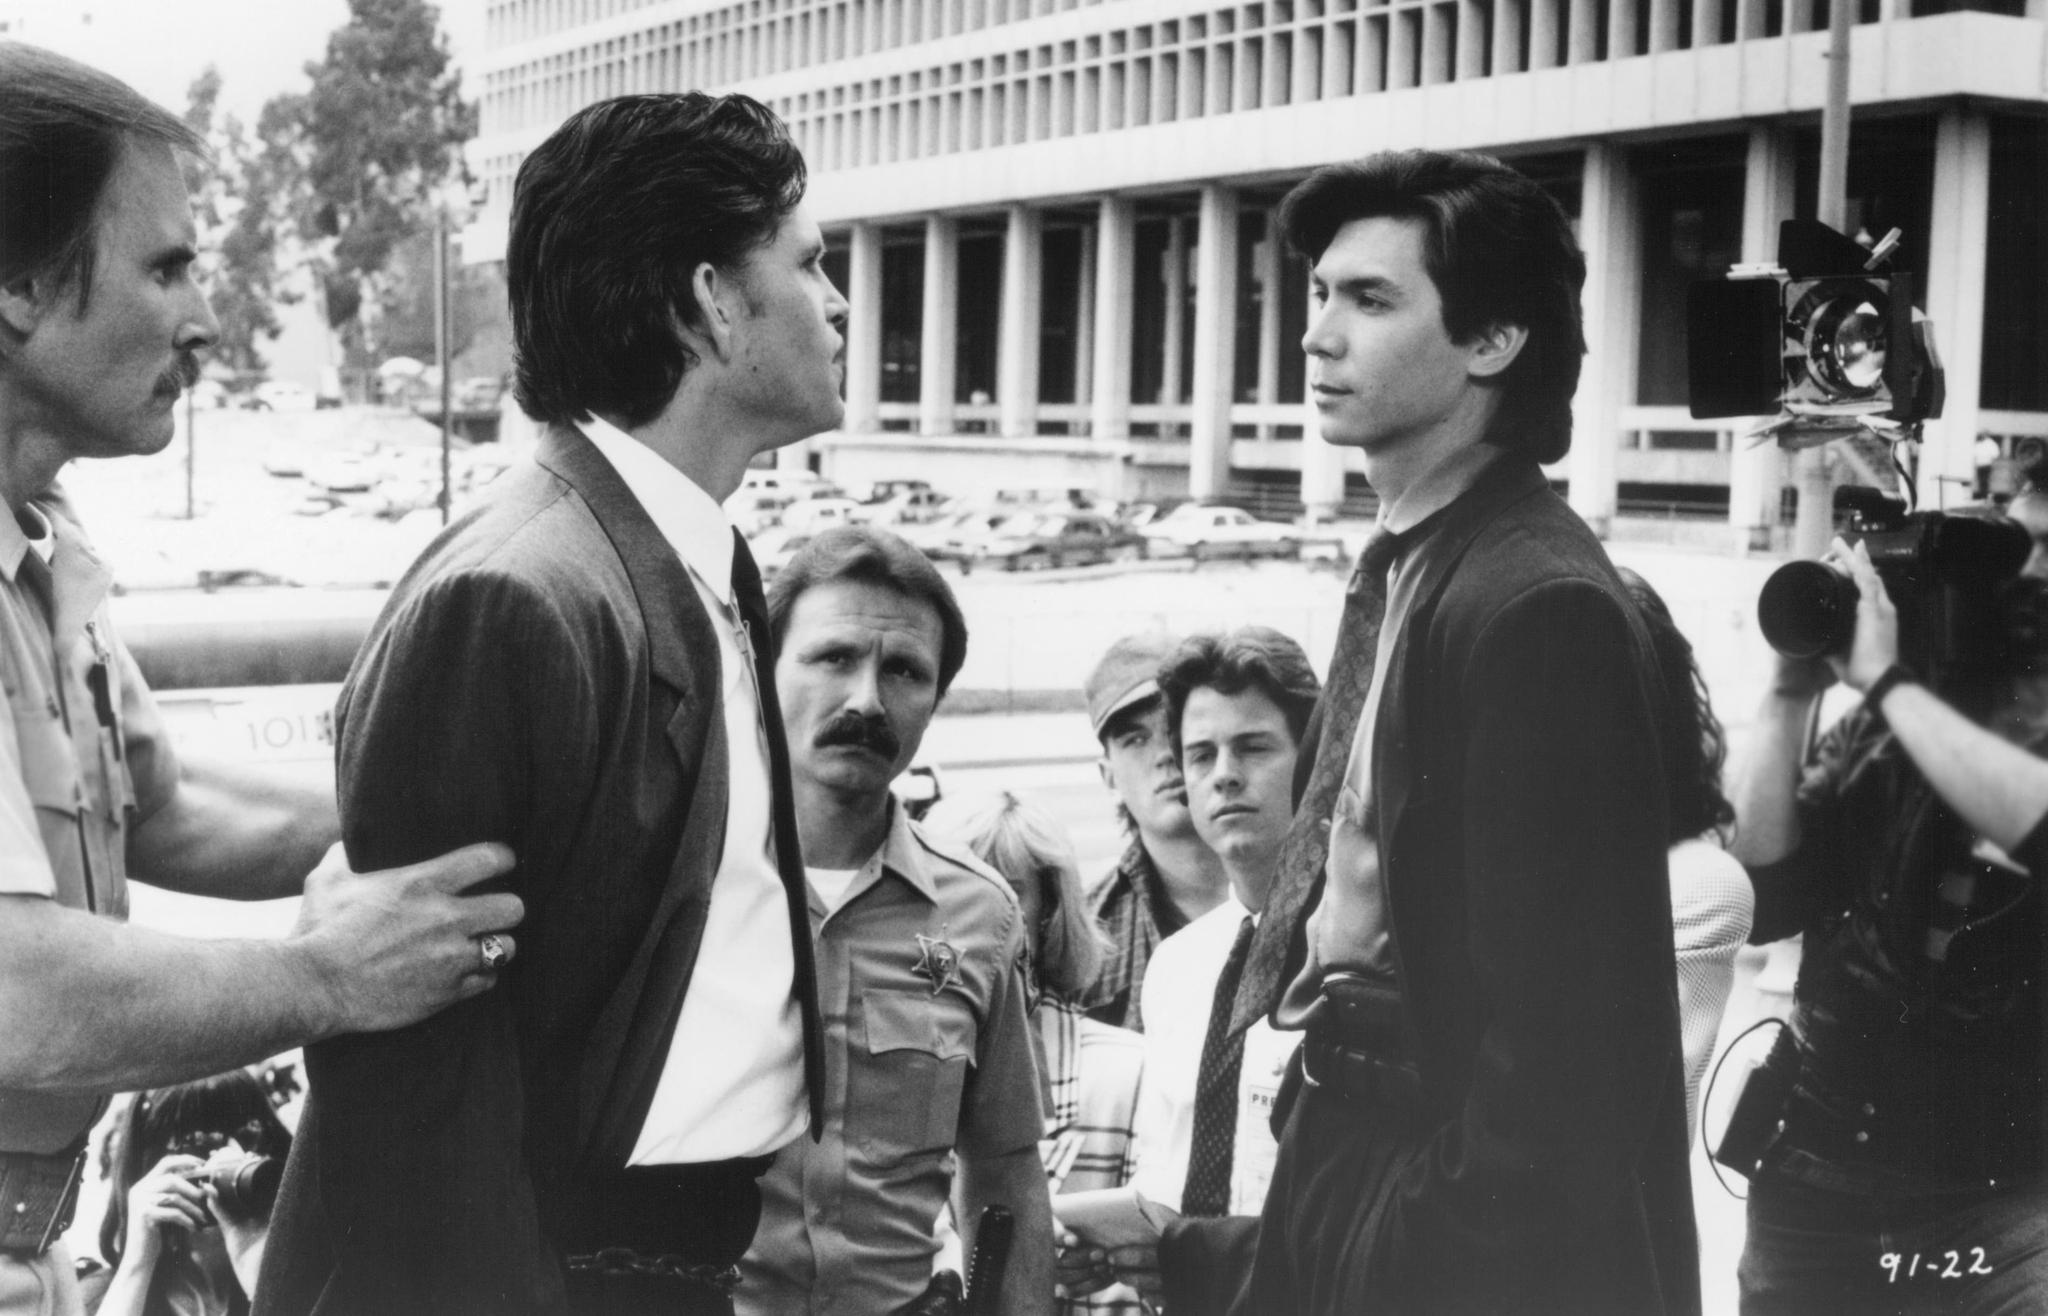 Lou Diamond Phillips, Elizabeth Arlen, Jeff Kober, and Mykelti Williamson in The First Power (1990)